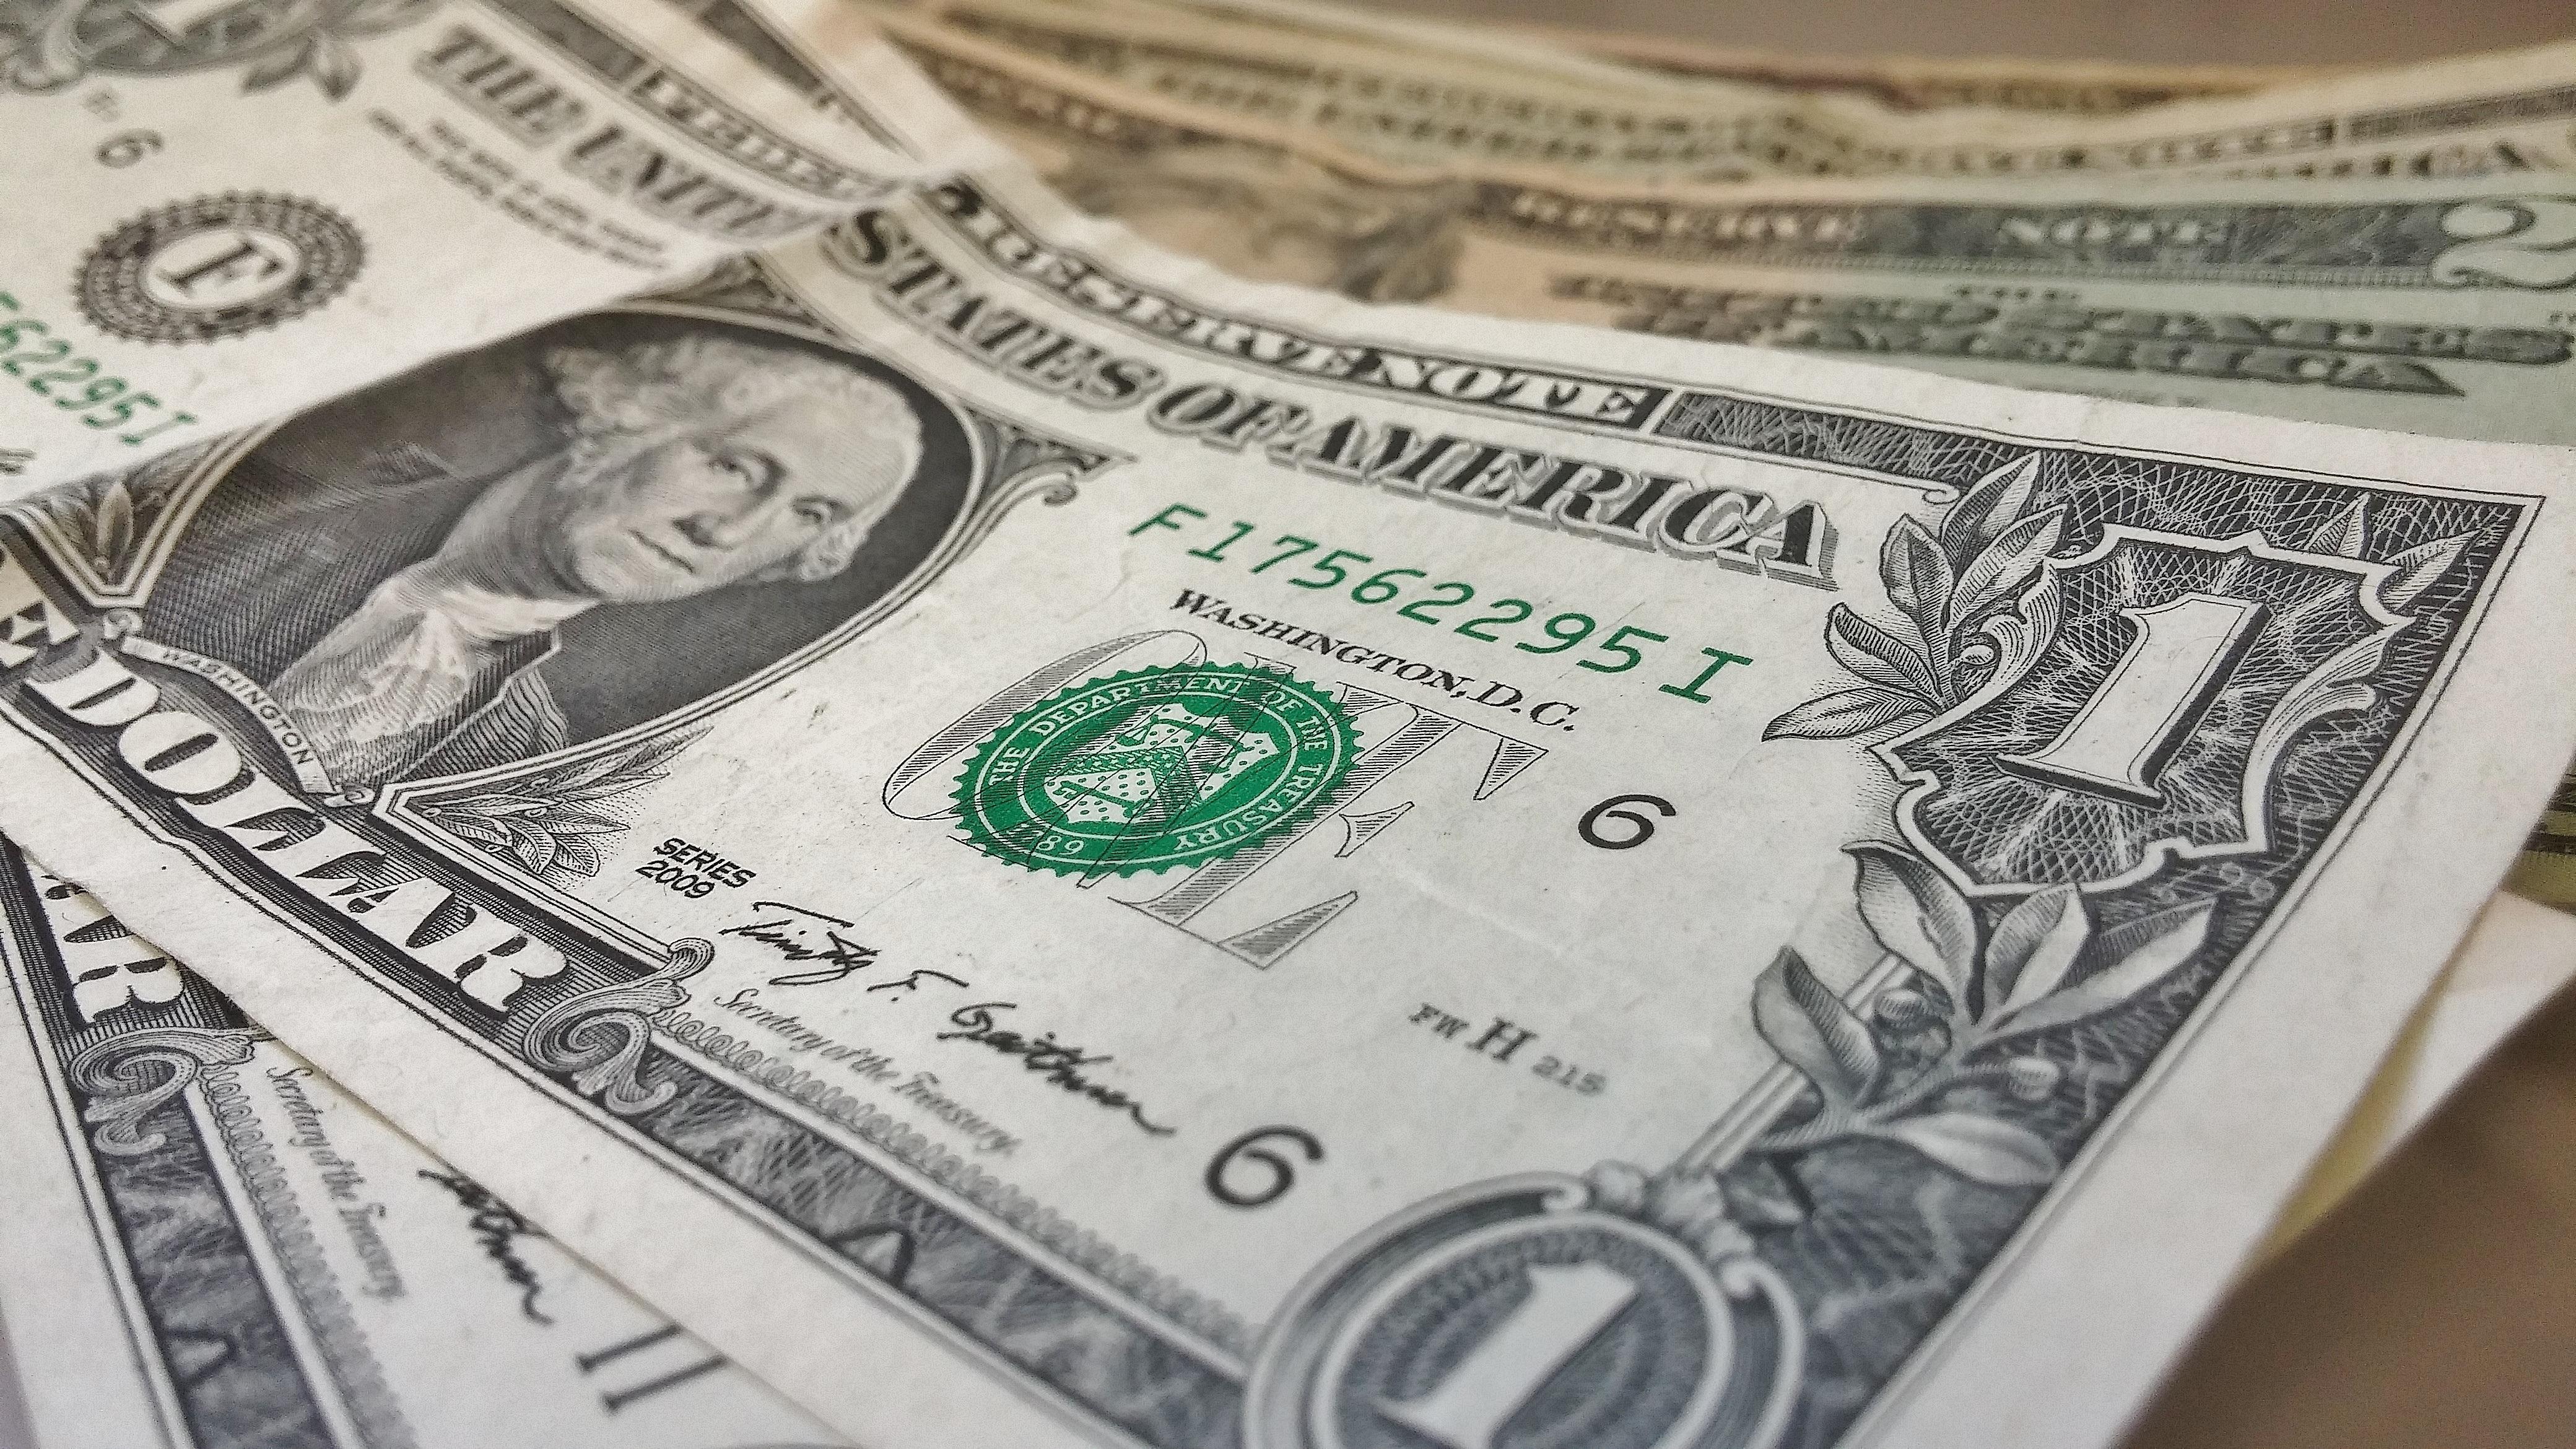 Usa America Money Cash Currency Dollar Rich Financial Savings Wealth Profit Banknotes Bills Dollars Us